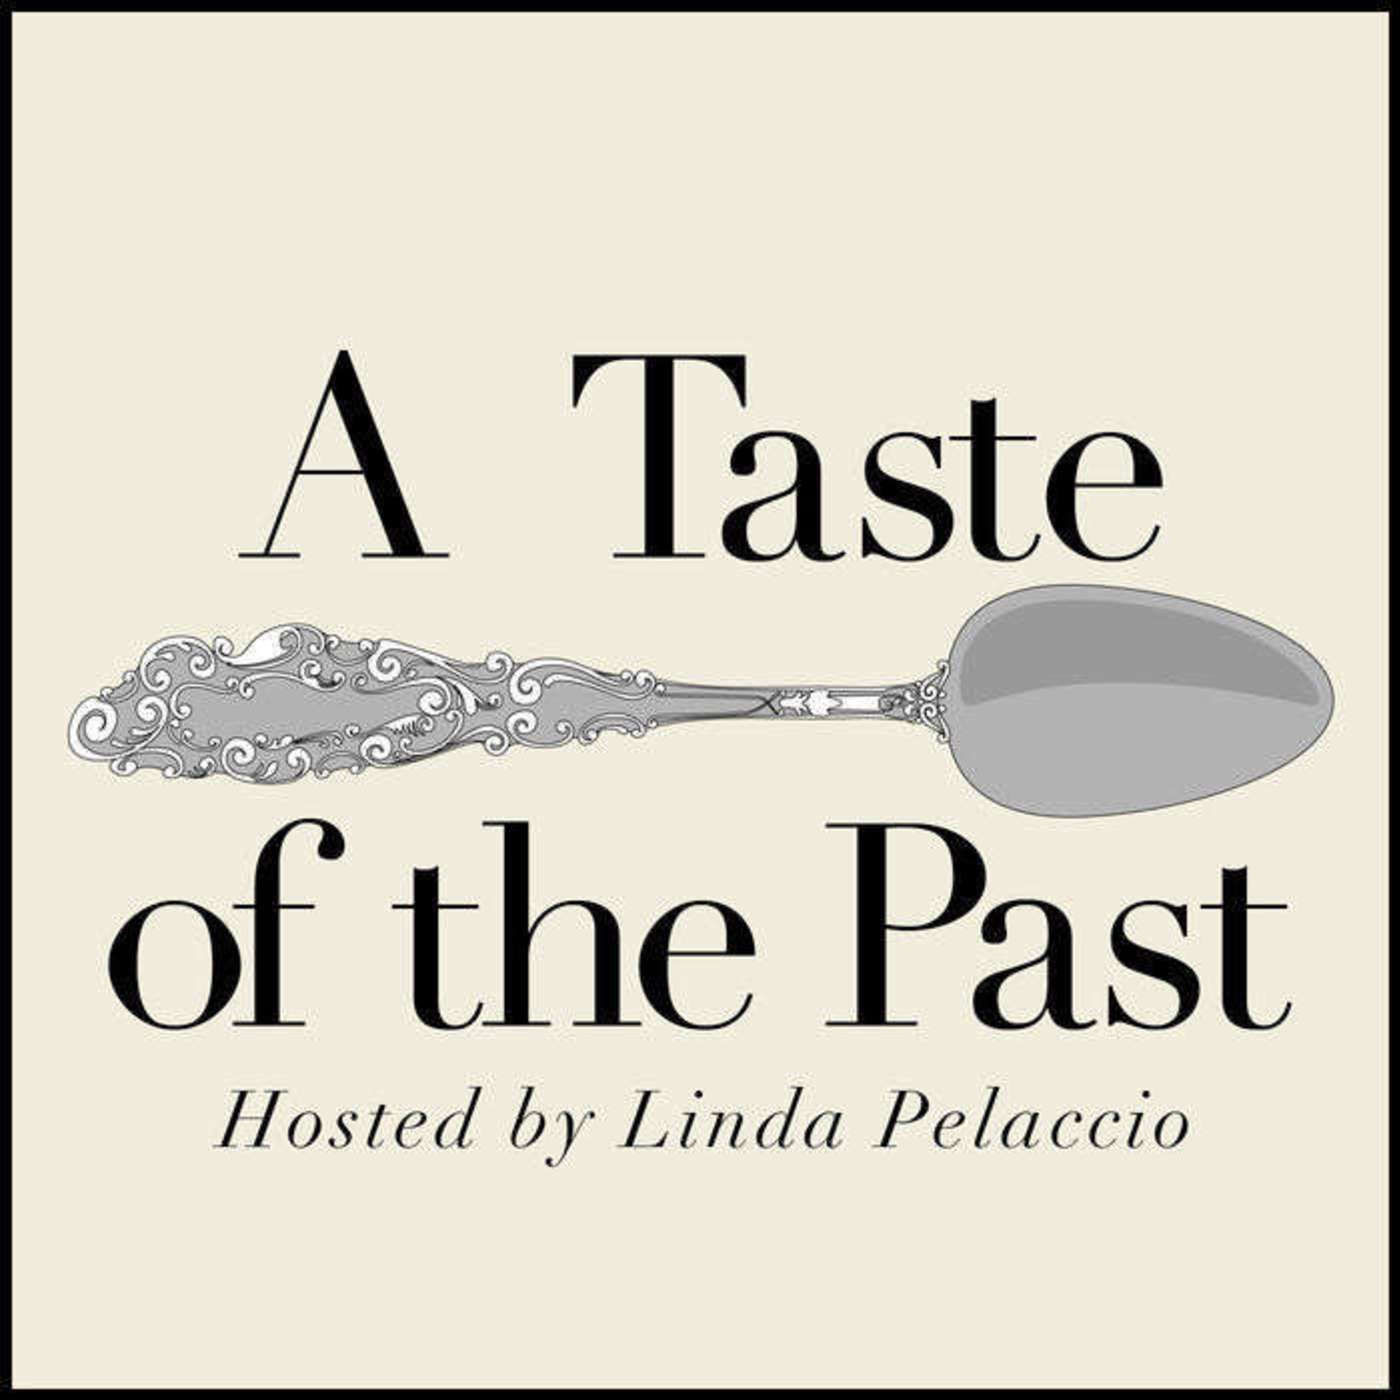 Episode 124: A Taste of Russia with Darra Goldstein